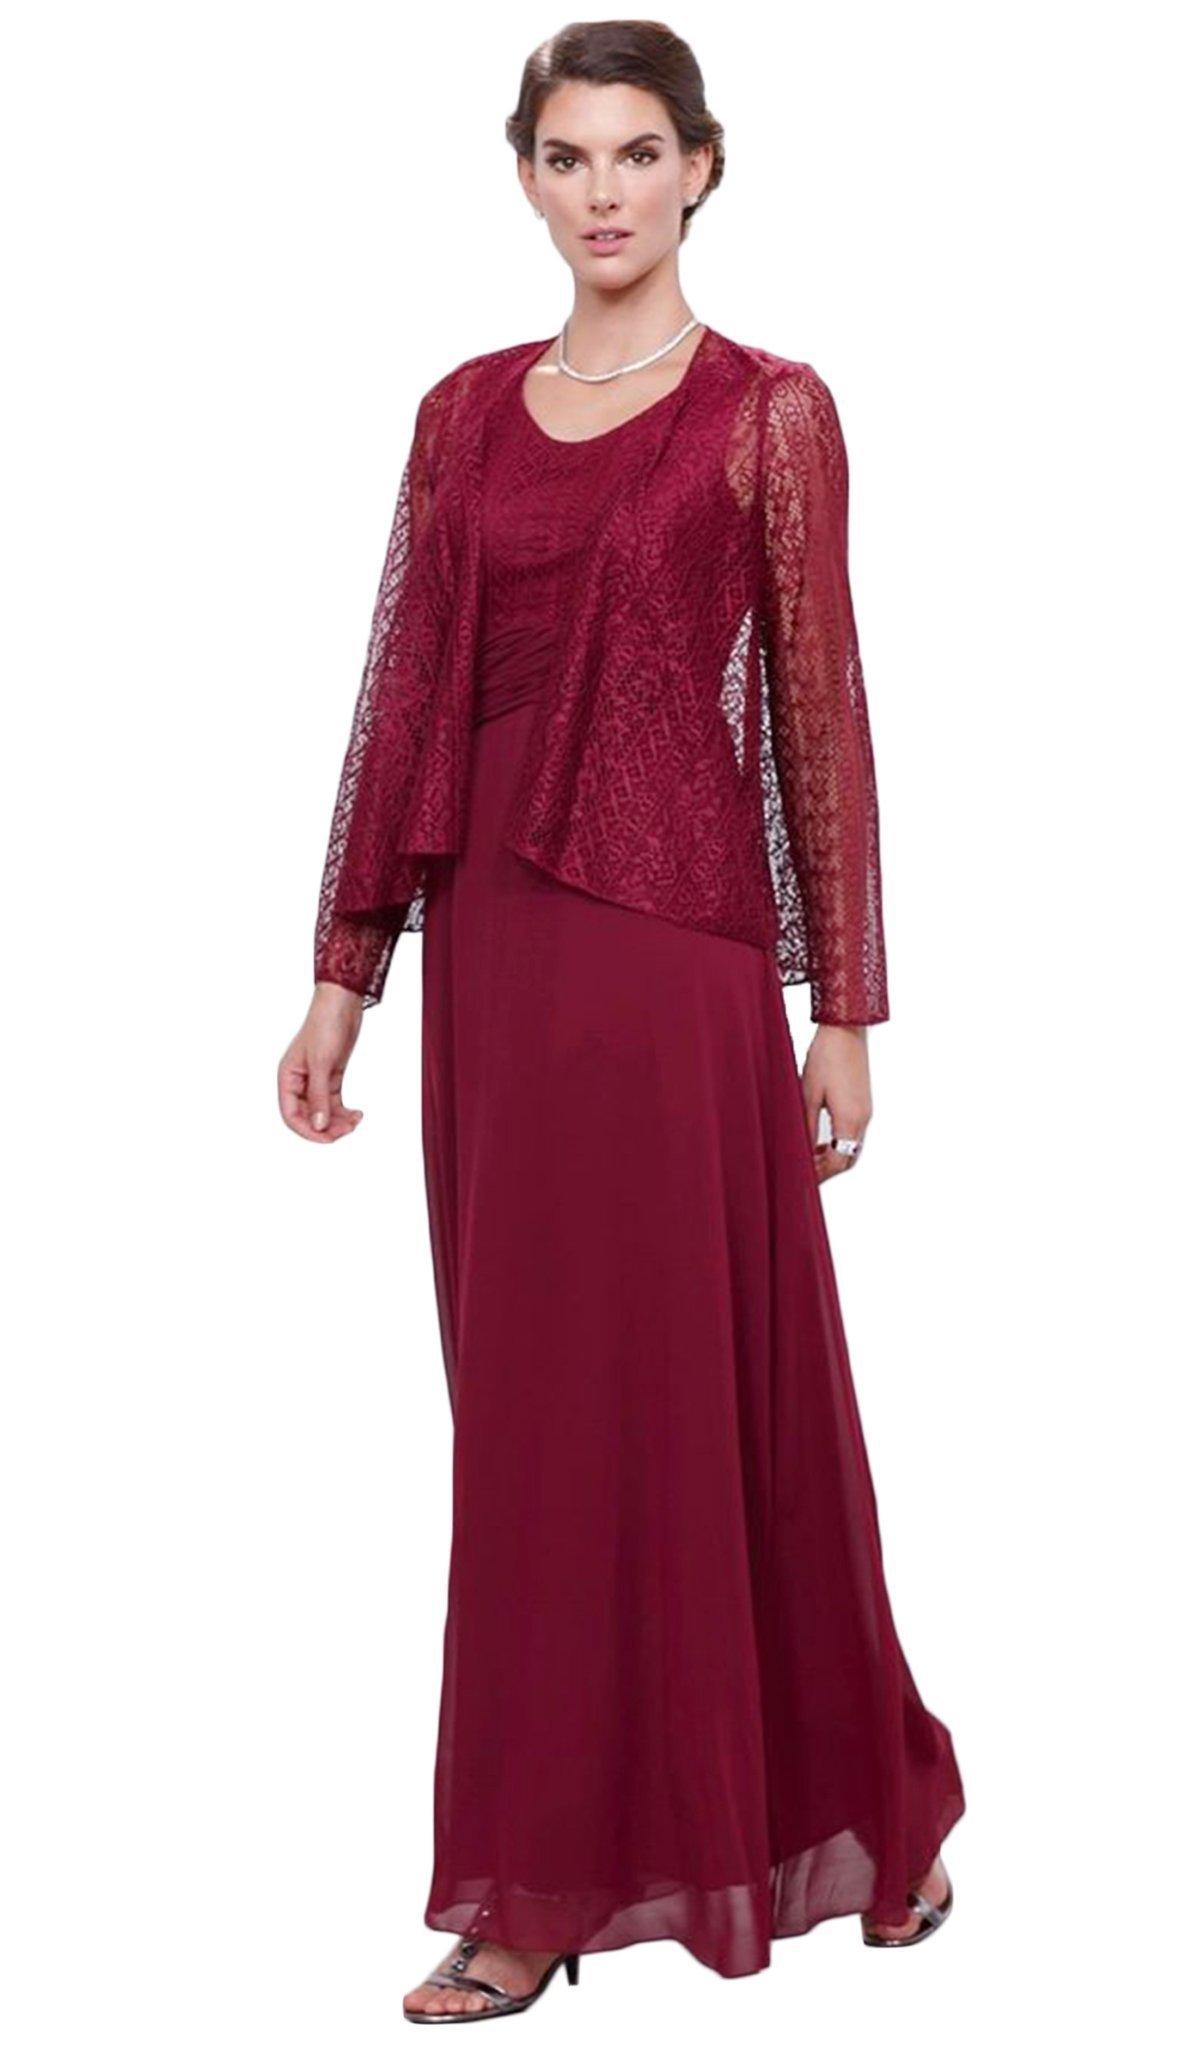 Nox Anabel - 5138 Lace Scoop Neck A-line Dress